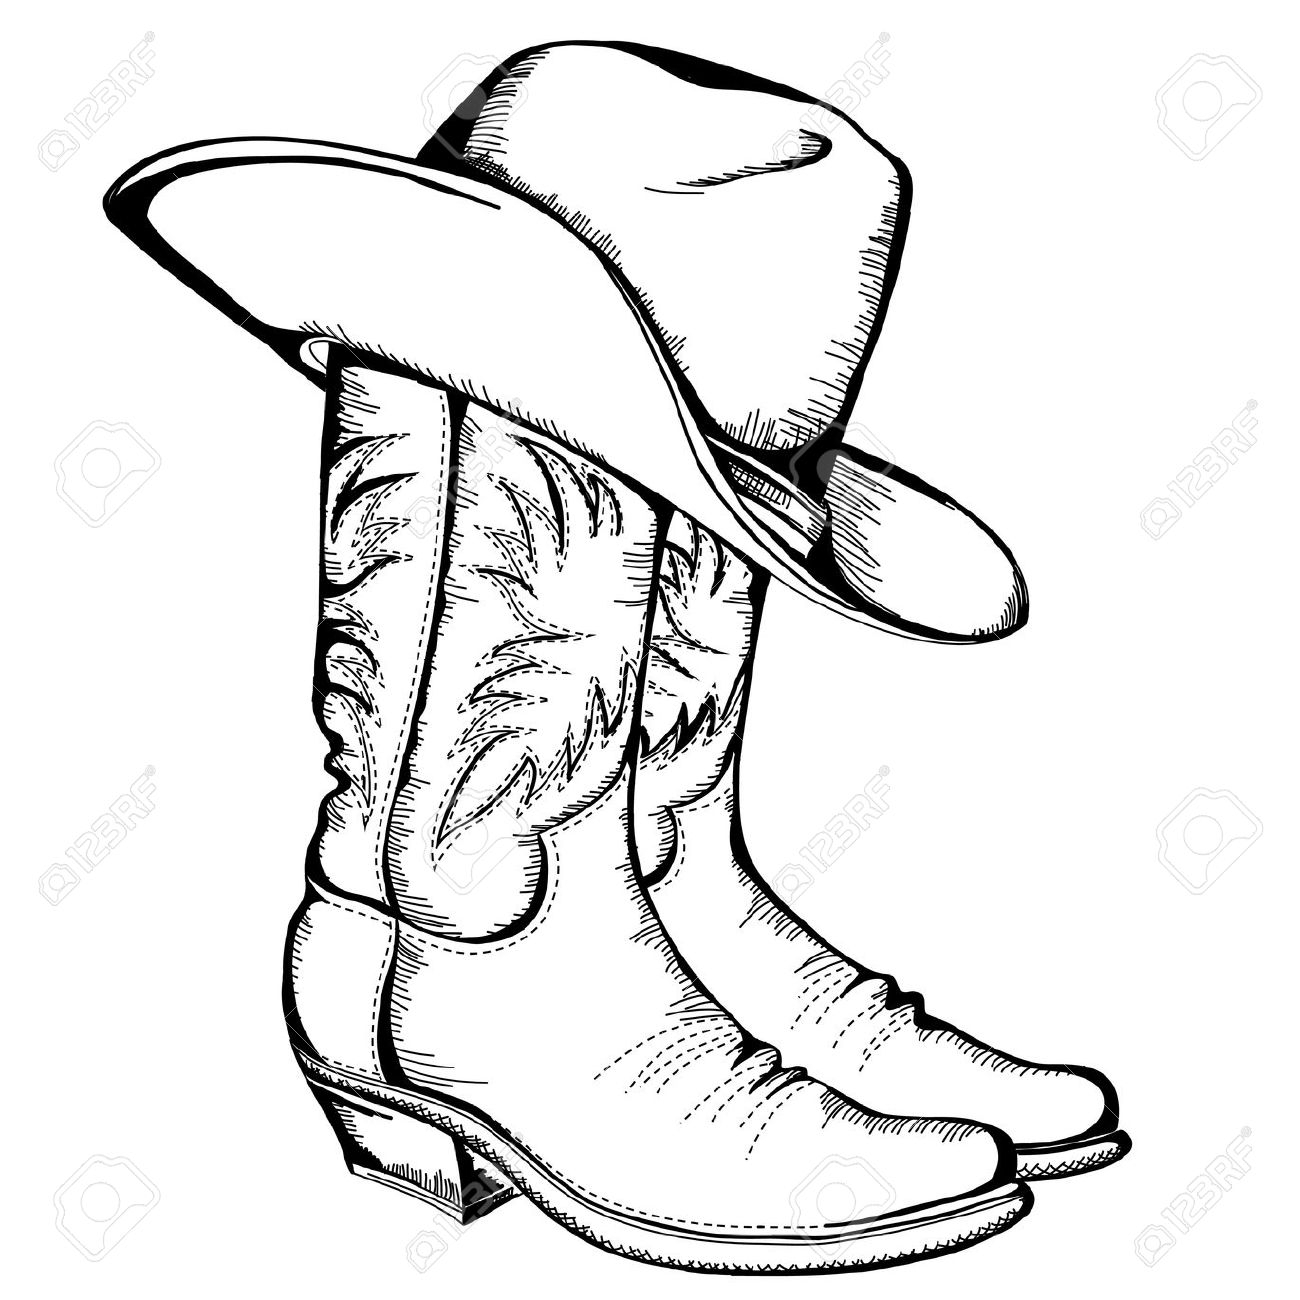 1300x1300 Drawing A Cowboy Hat 8,088 Cowboy Hat Cliparts, Stock Vector